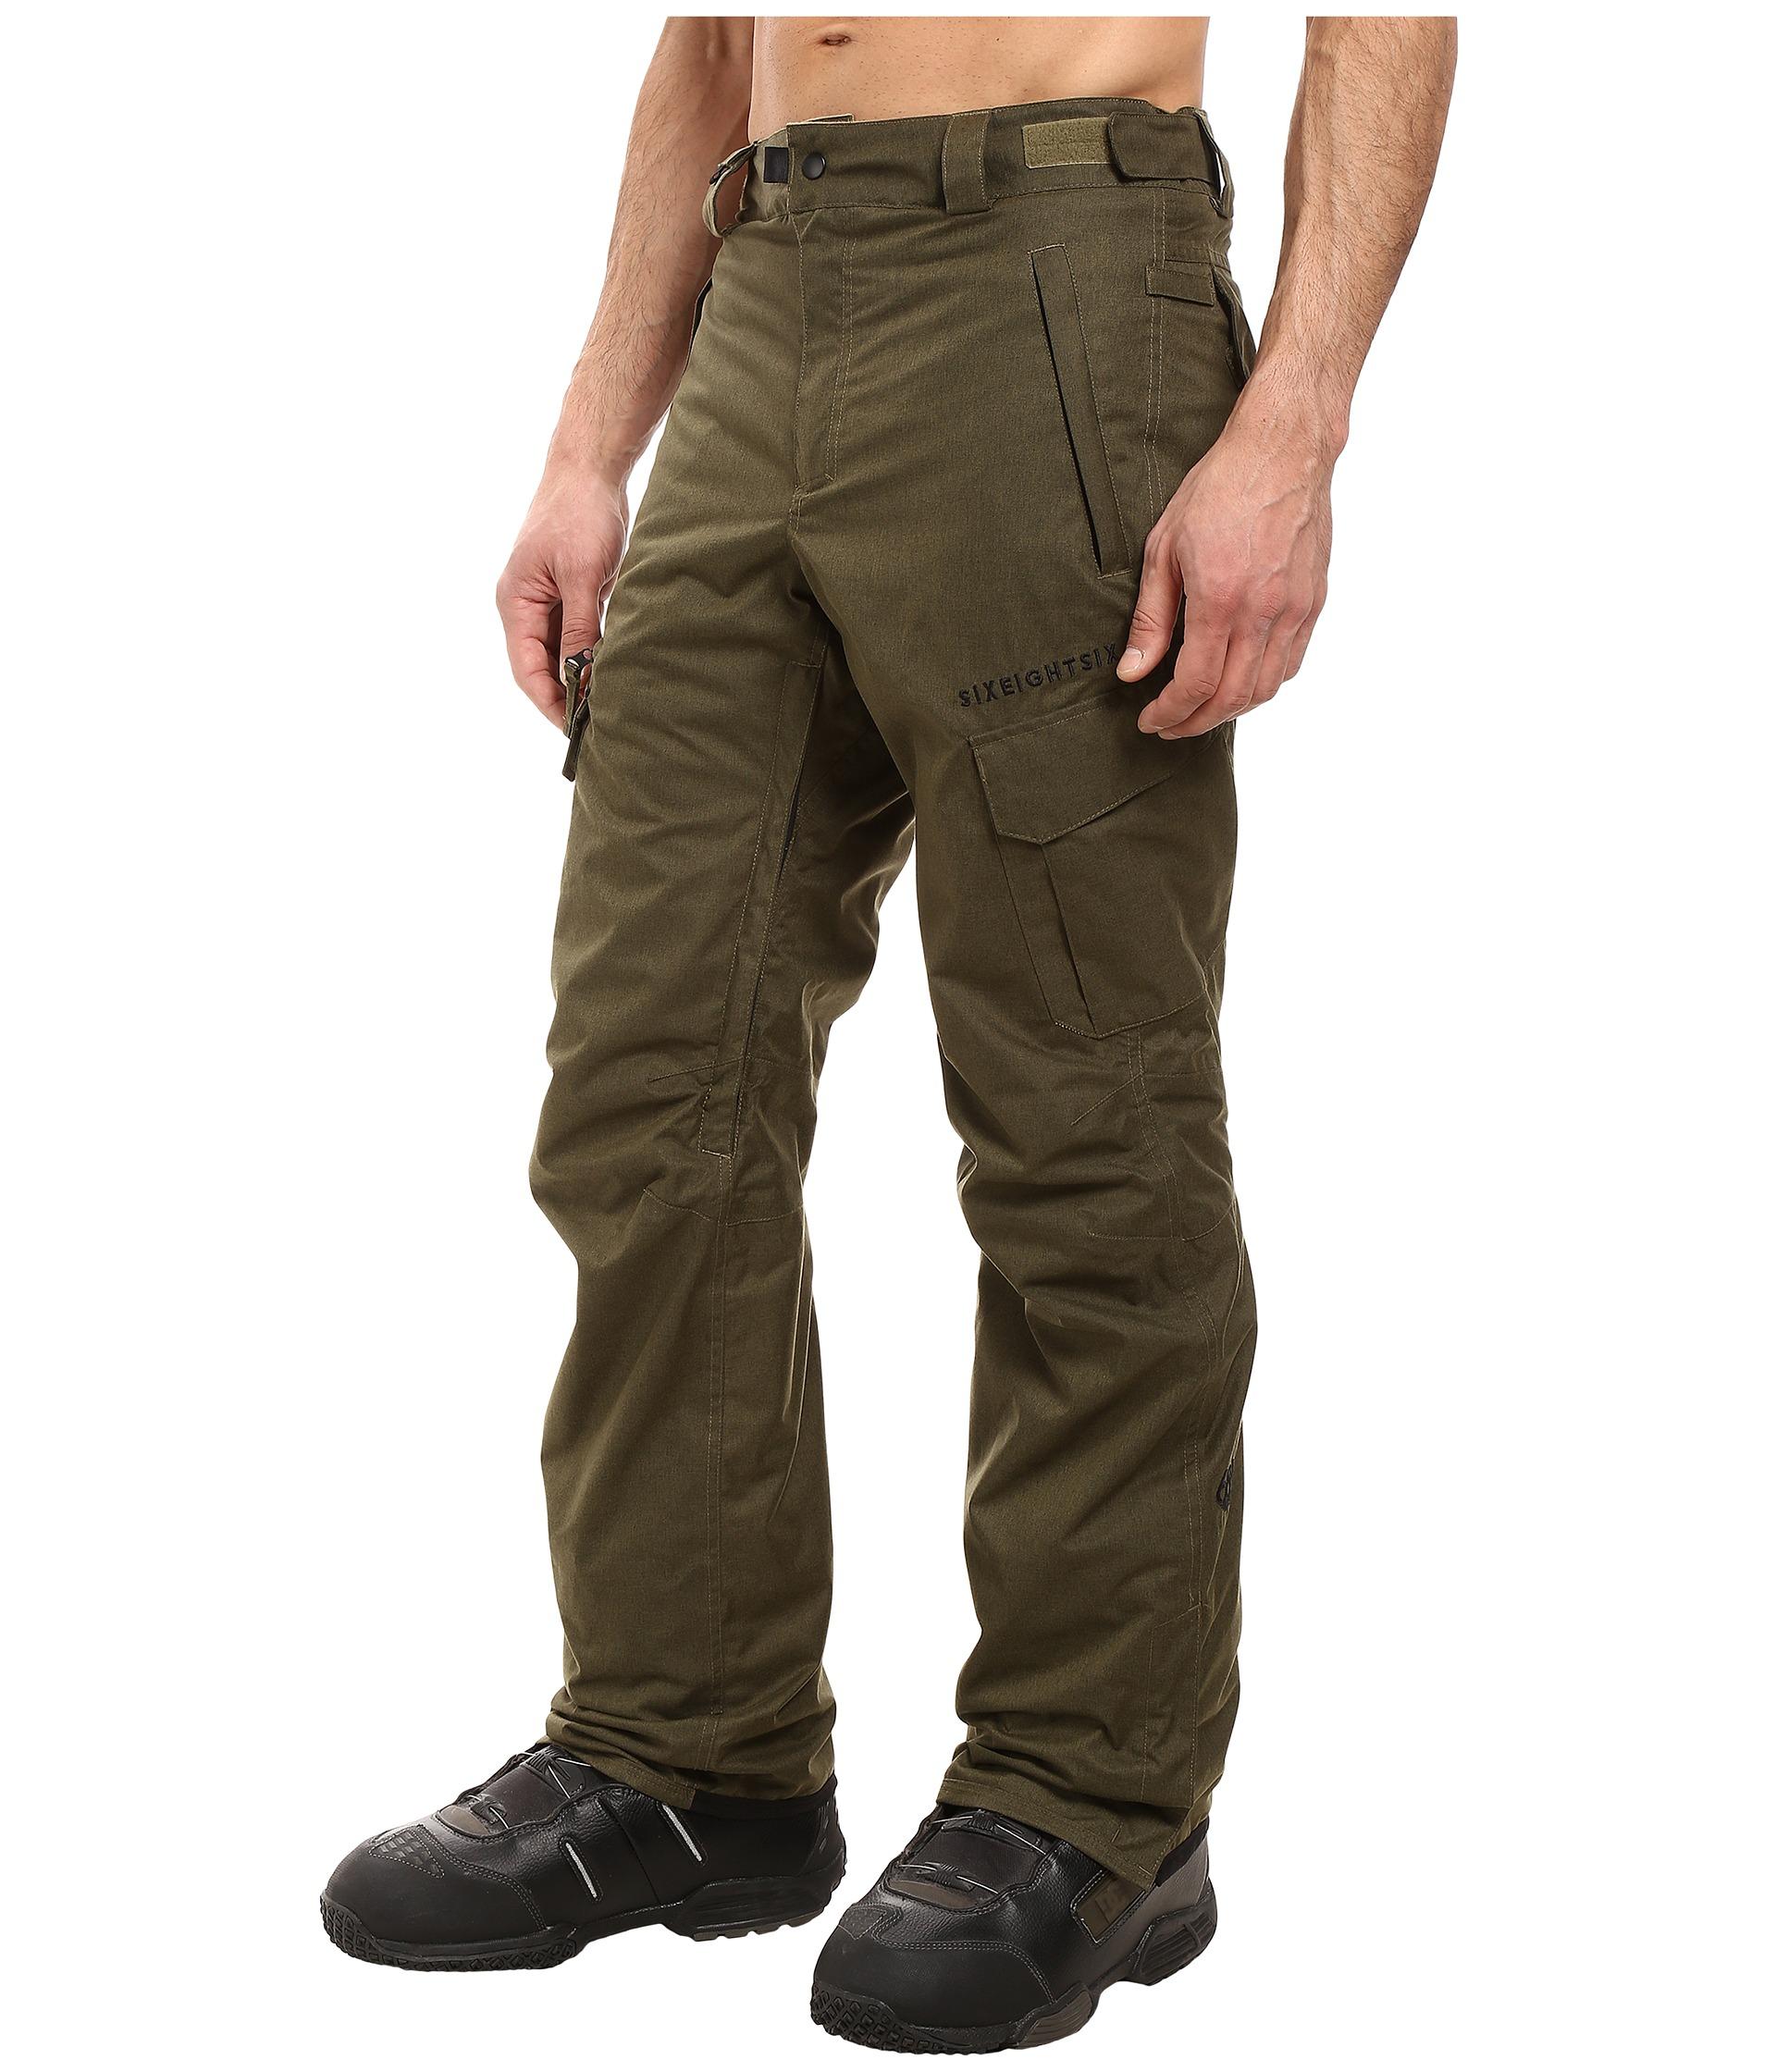 686 Authentic Smarty Cargo Pants Olive Melange